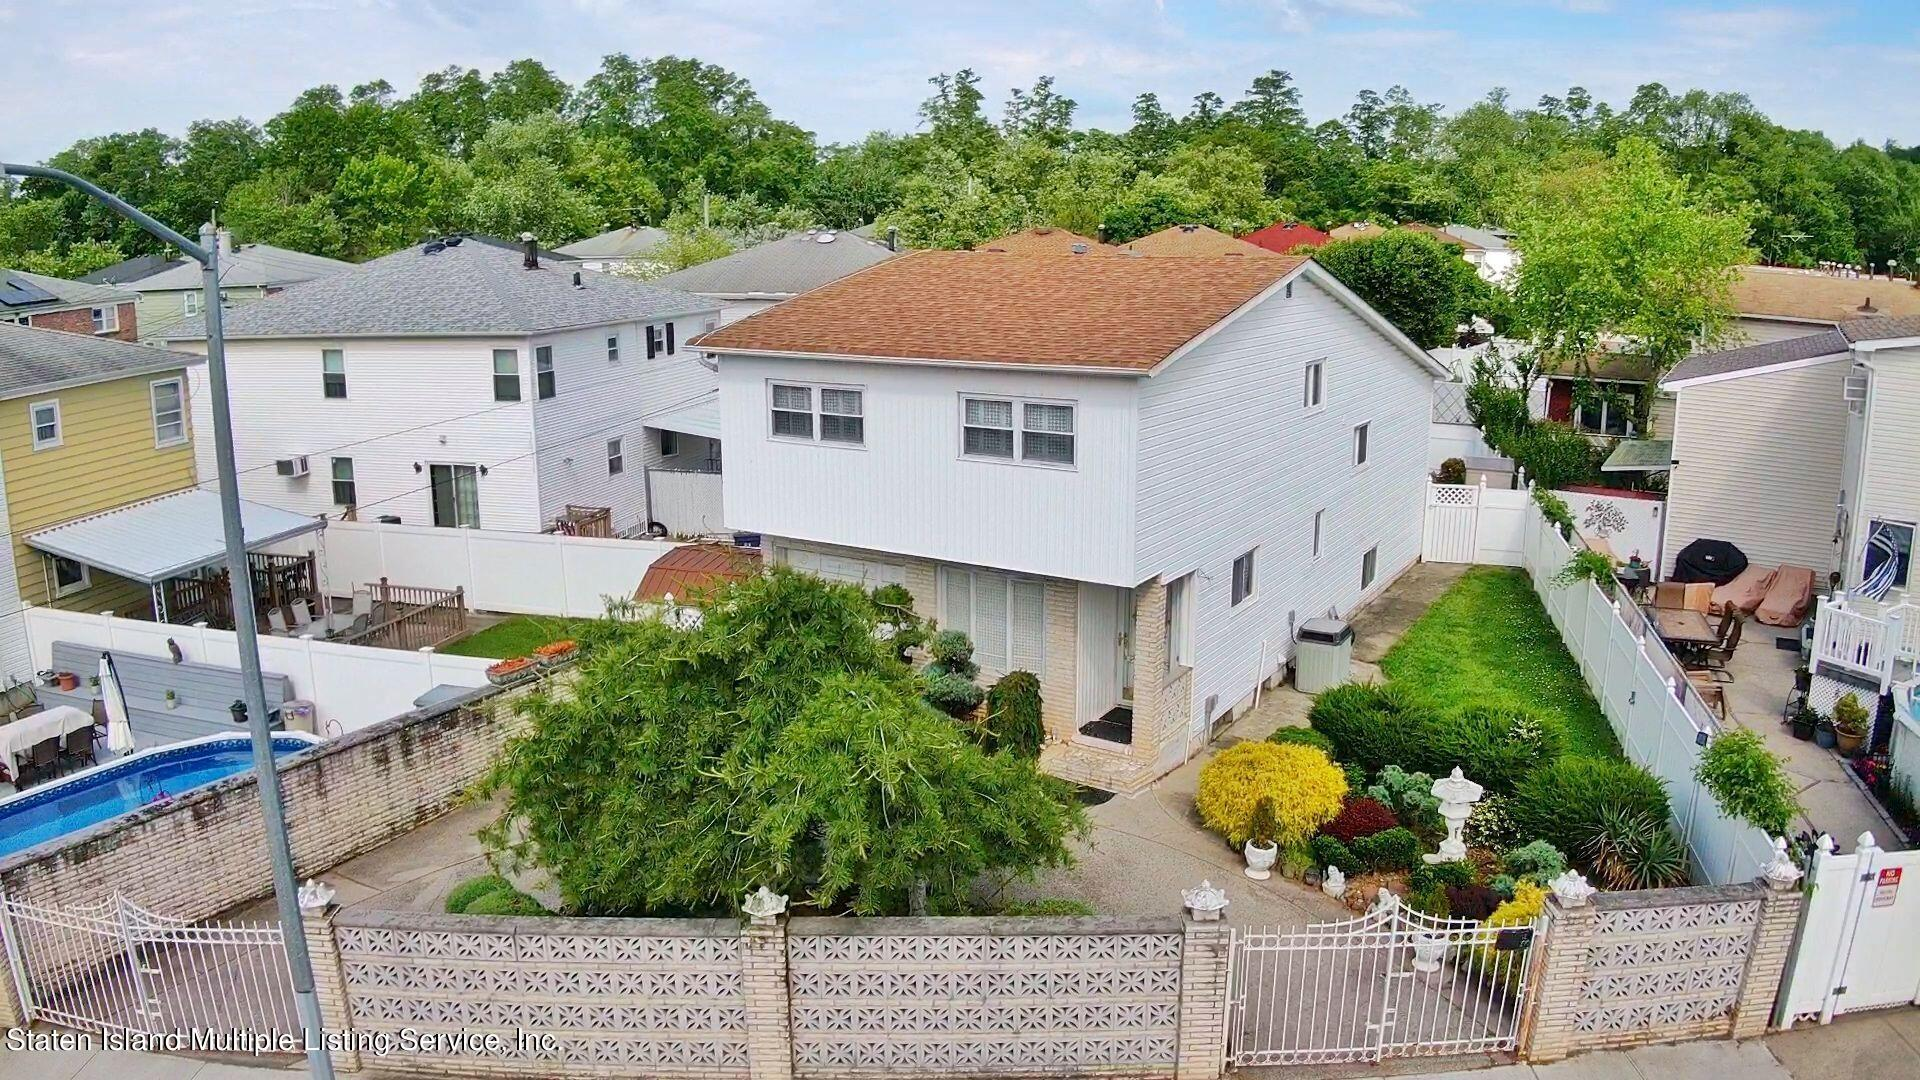 Single Family - Detached 94 Cranford Avenue  Staten Island, NY 10306, MLS-1146620-46